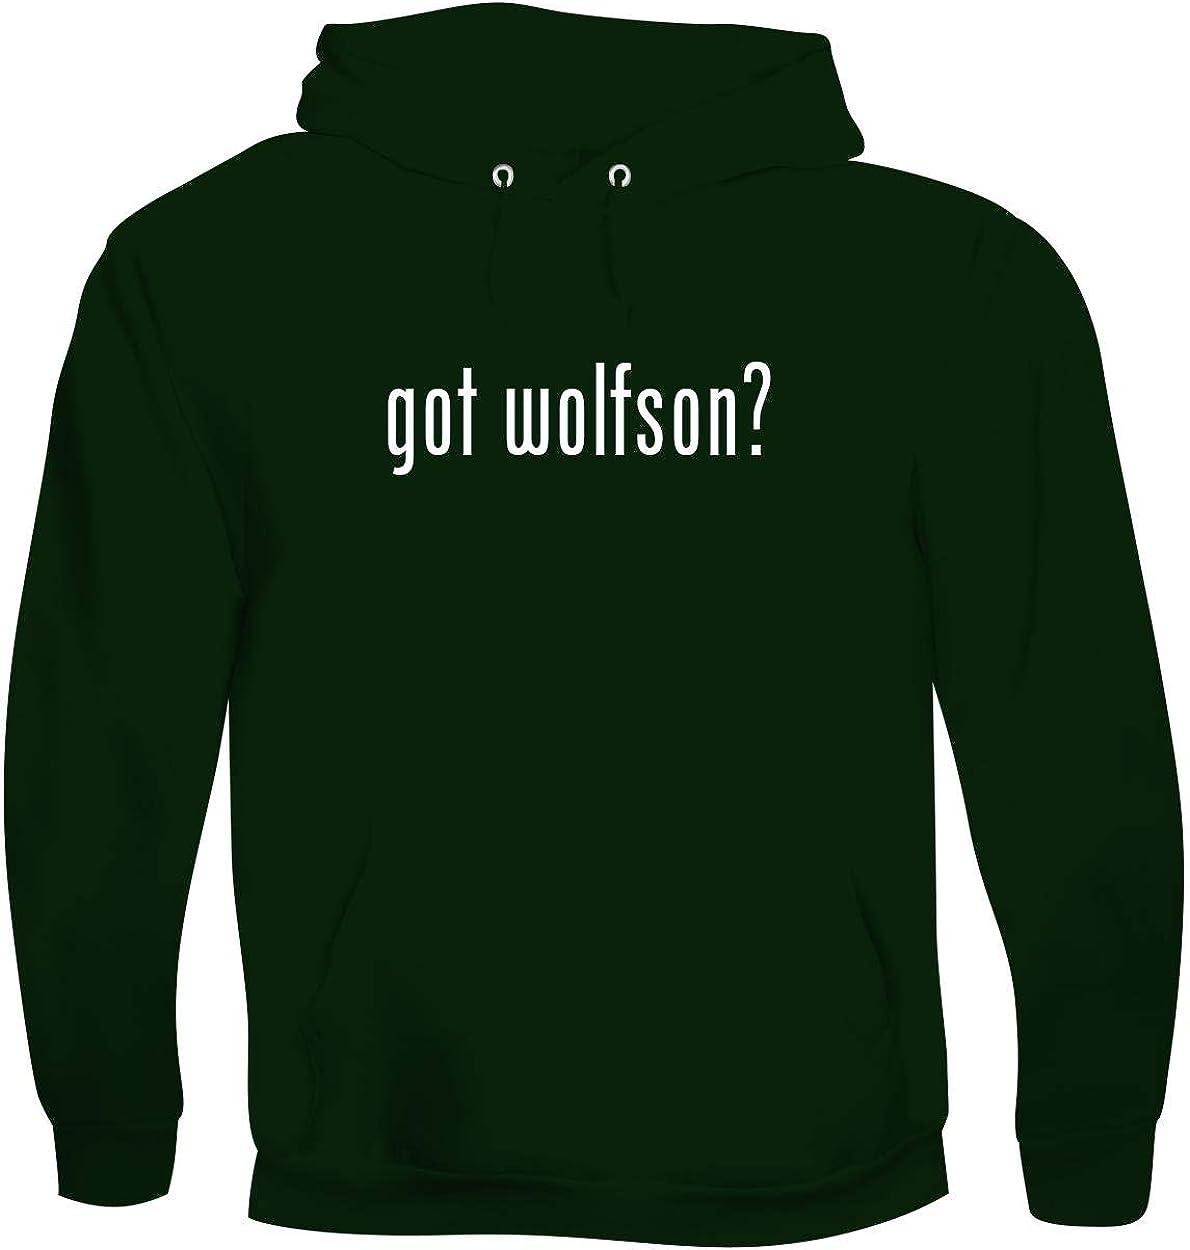 bekam Wolfson - Men'S Soft & Comfortable Hoodie Sweatshirt Pullover